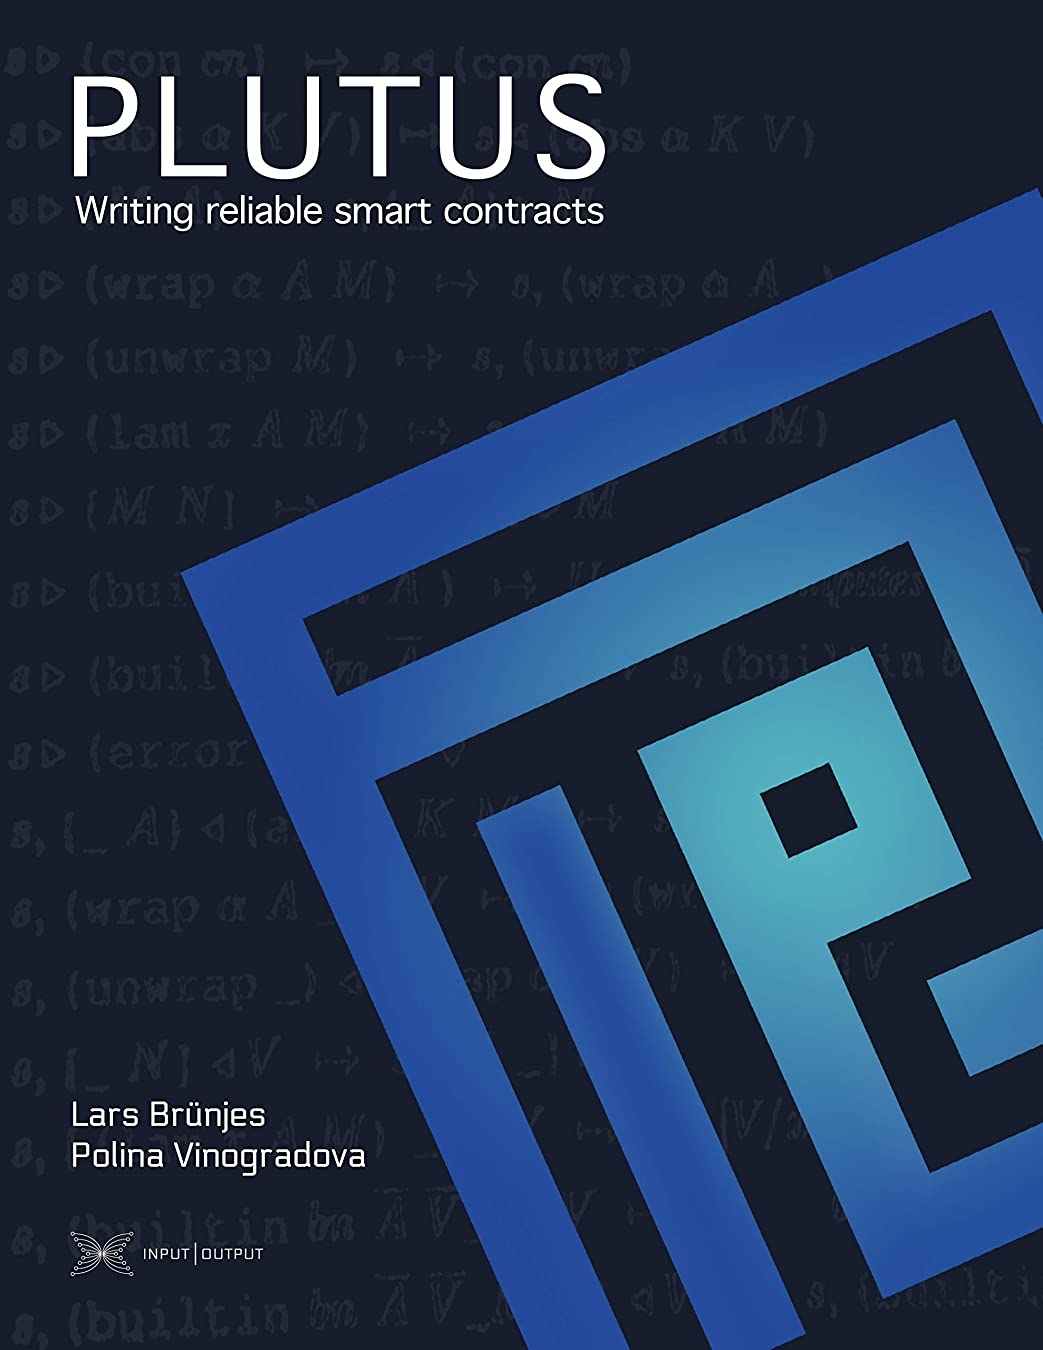 Plutus: Writing reliable smart contracts (mobi) (English Edition)